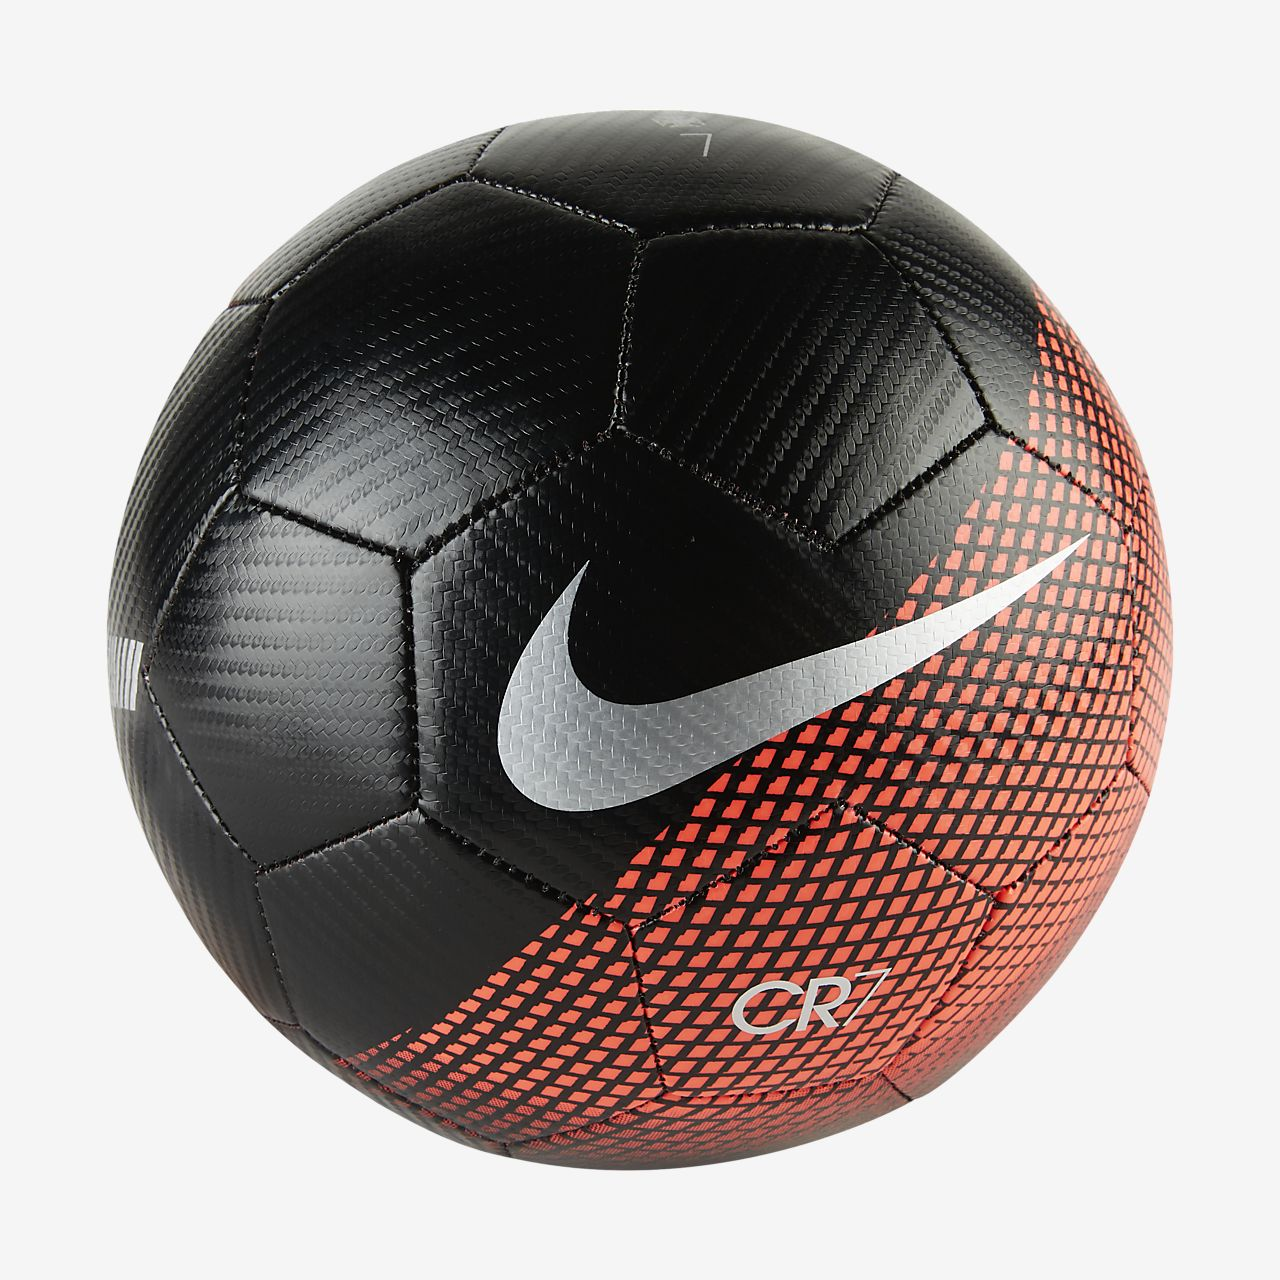 Balón de fútbol Nike CR7 Prestige